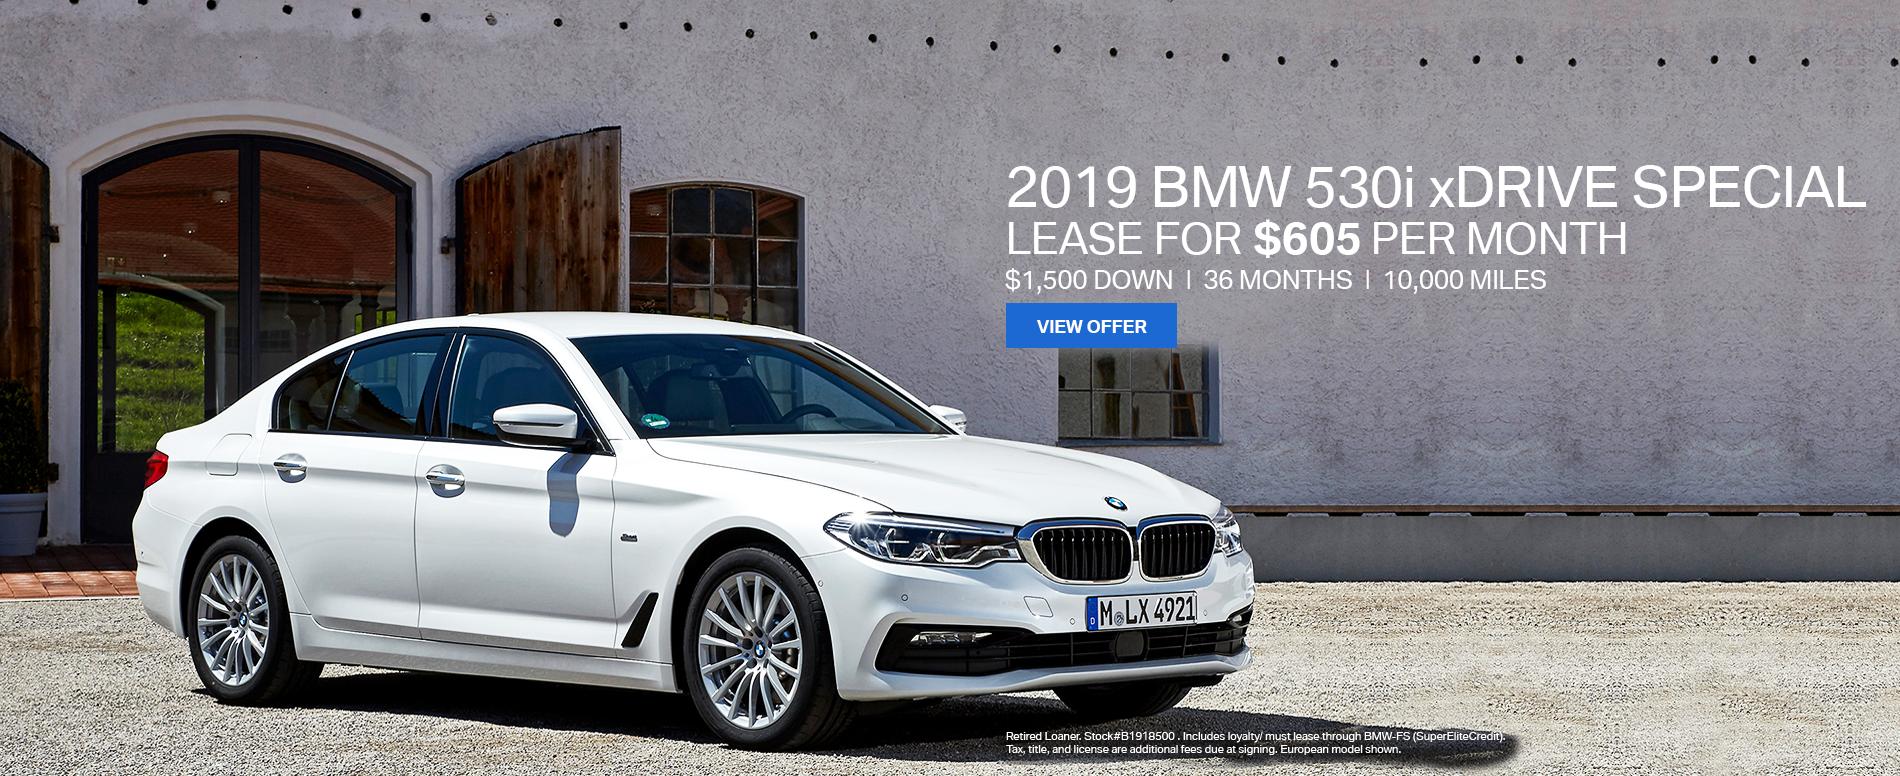 BMW Farmington Hills >> Bmw Dealer In Bloomfield Hills Mi Pre Owned Cars